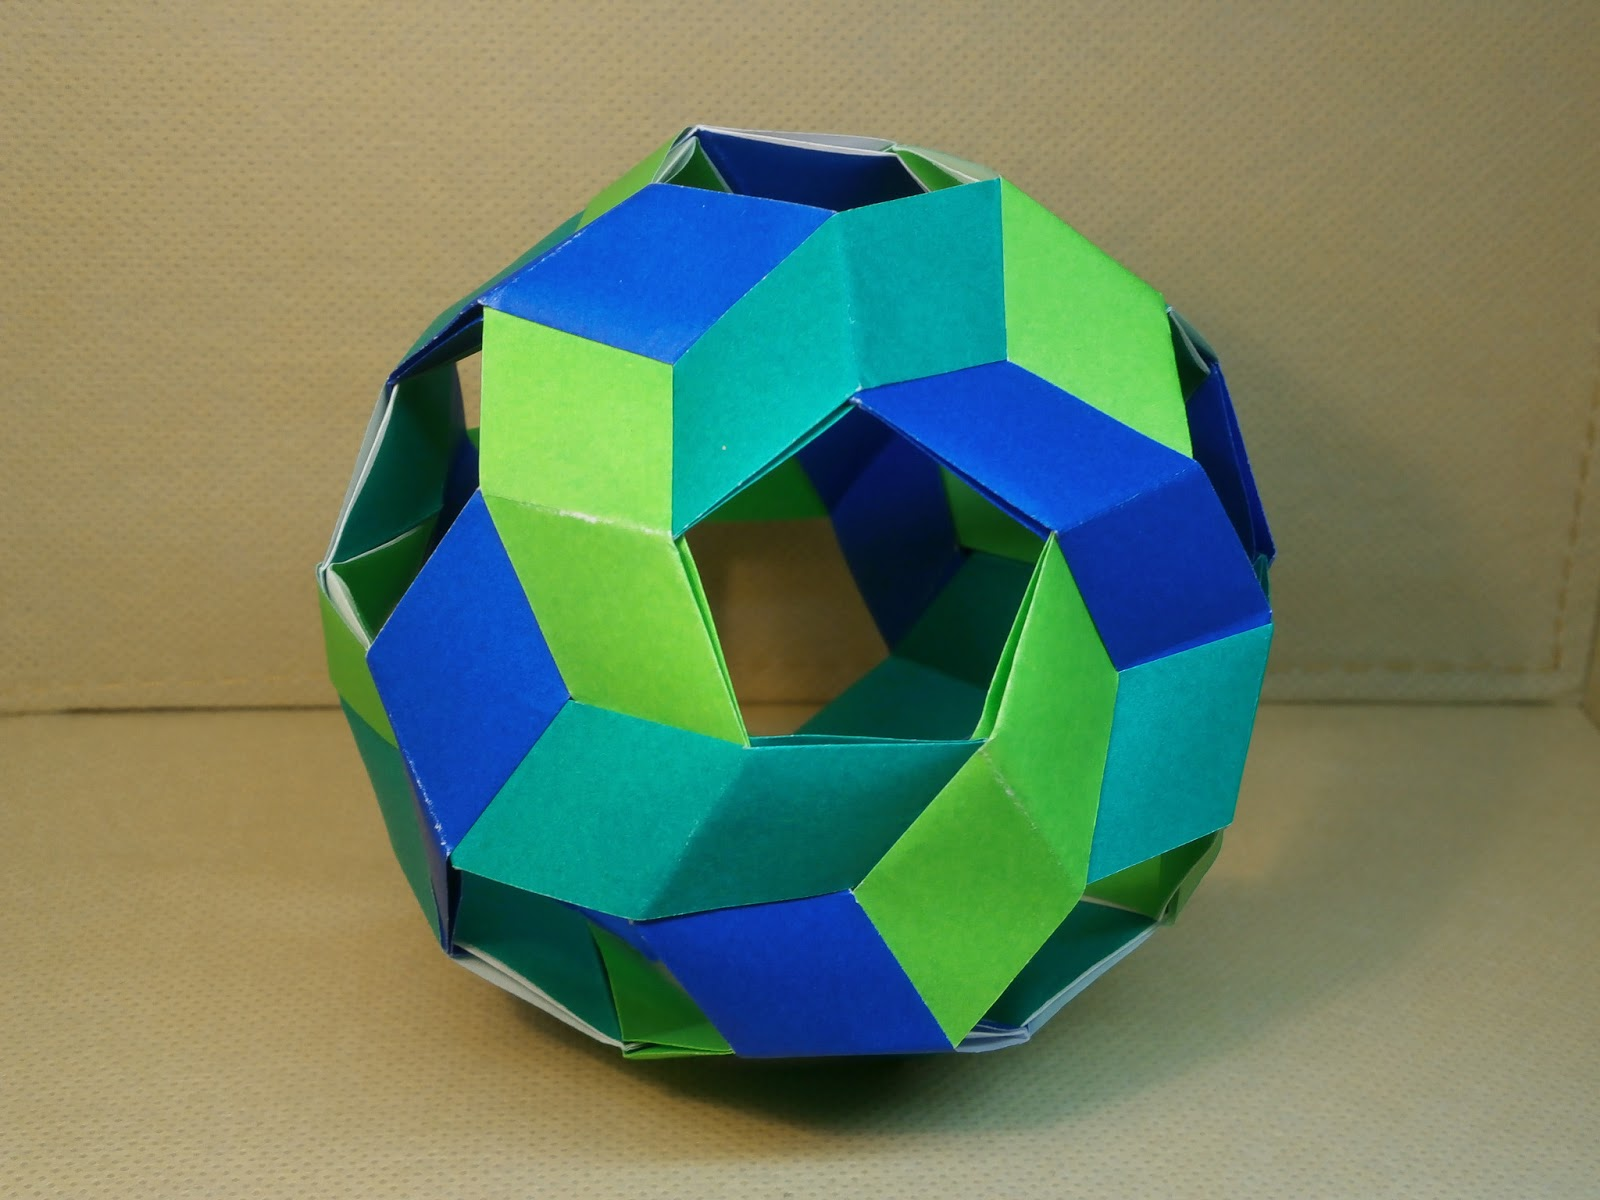 Cool Modular Origami Diagram Project Network Critical Path Katakoto The Way Of Unit Ball